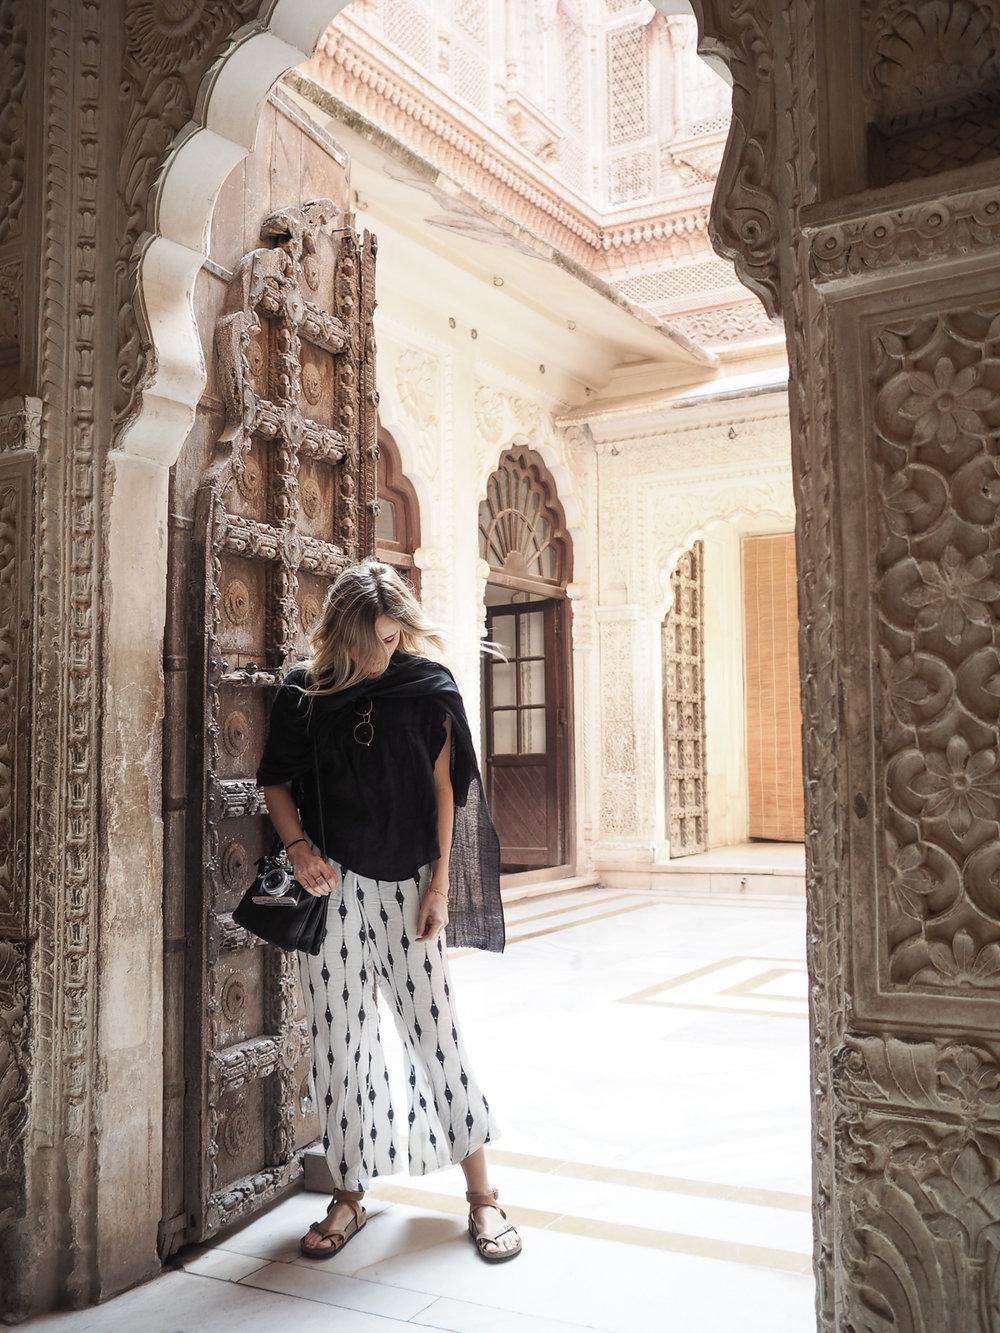 Fashion-Me-Now-Rajasthan-Road-Trip-Jodhpur-Photo-Diary-51.jpg